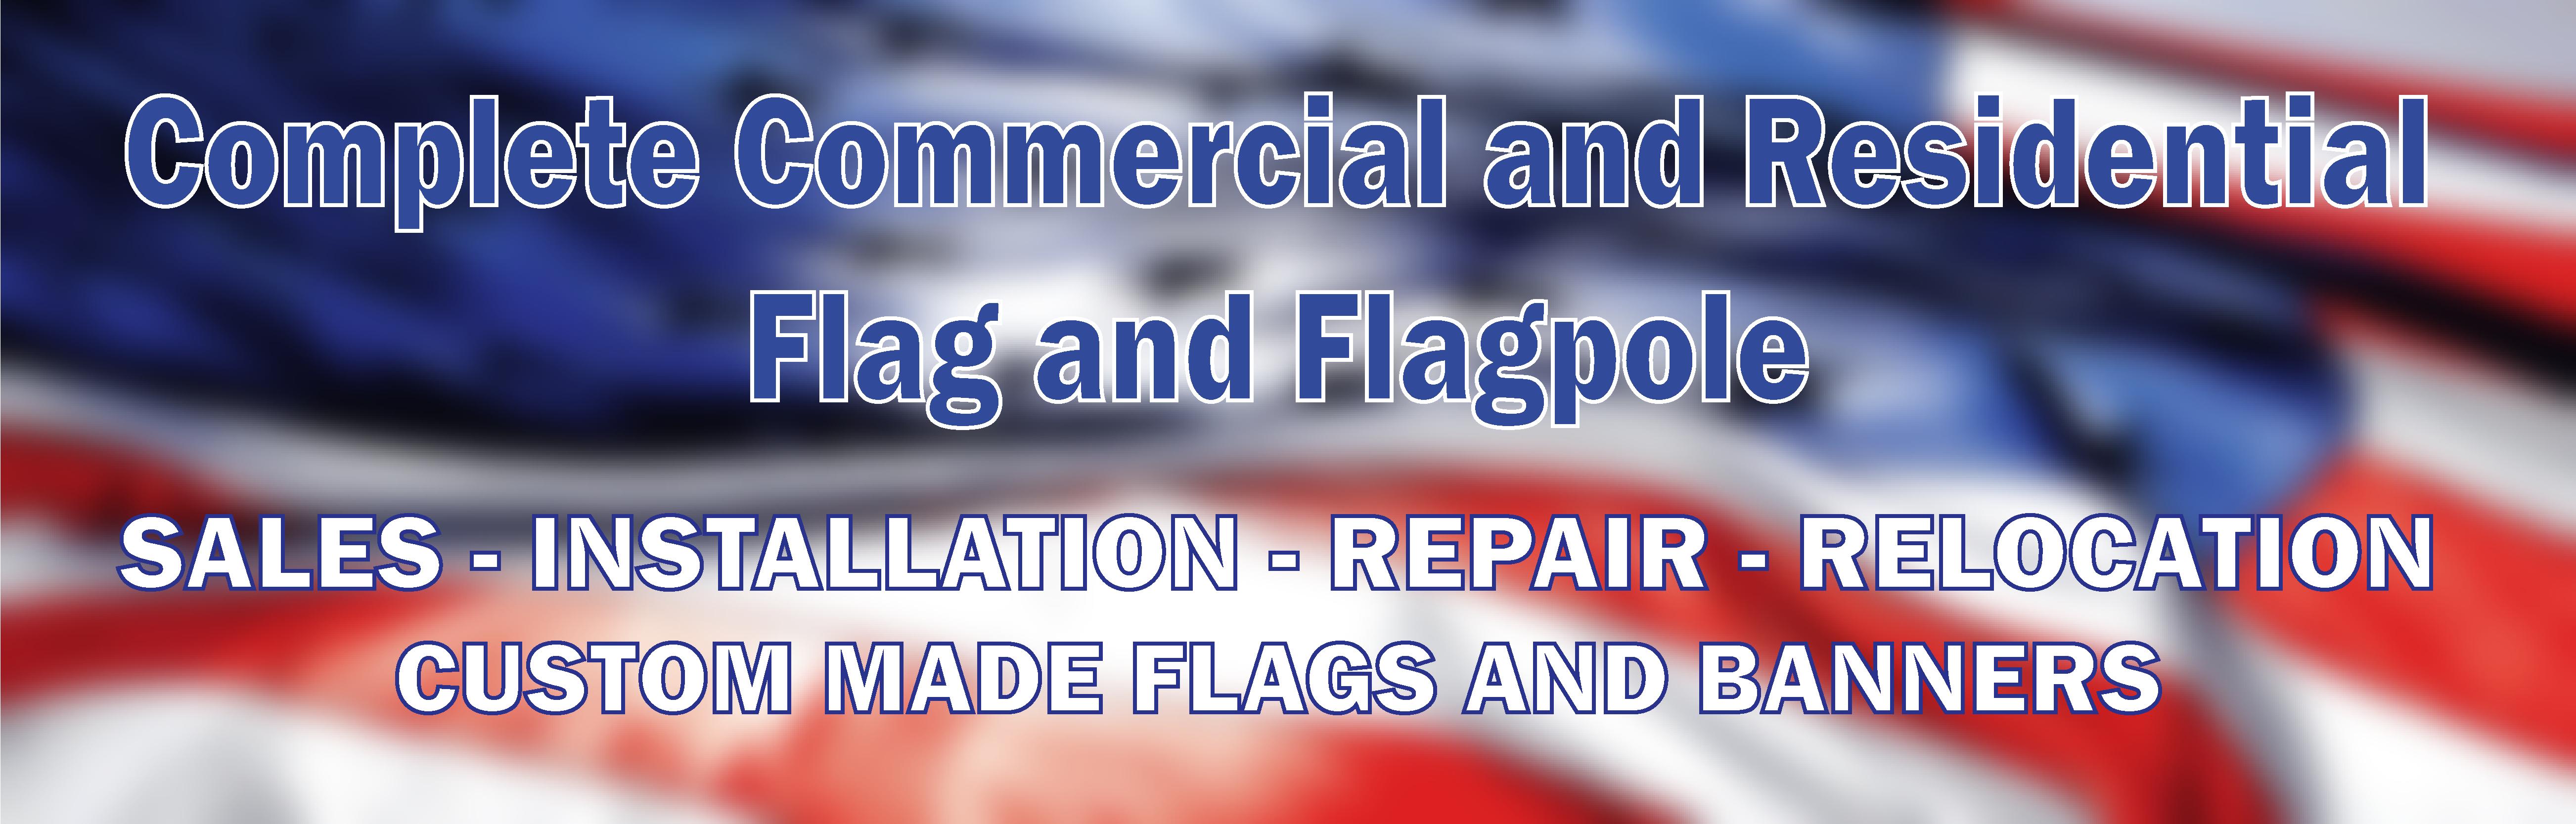 Flags, Flagpoles, custom made flags, San Antonio, TX